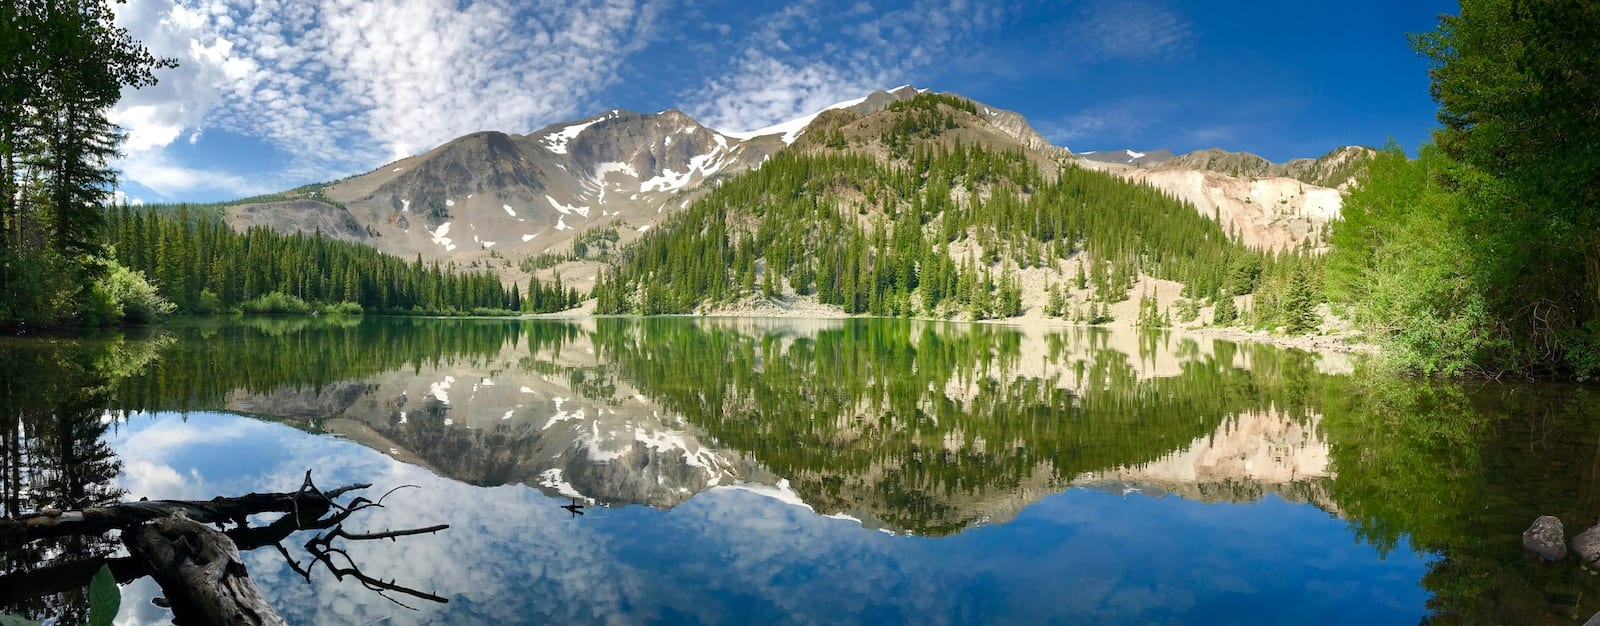 Danau Thomas Bawah Gunung Sopris